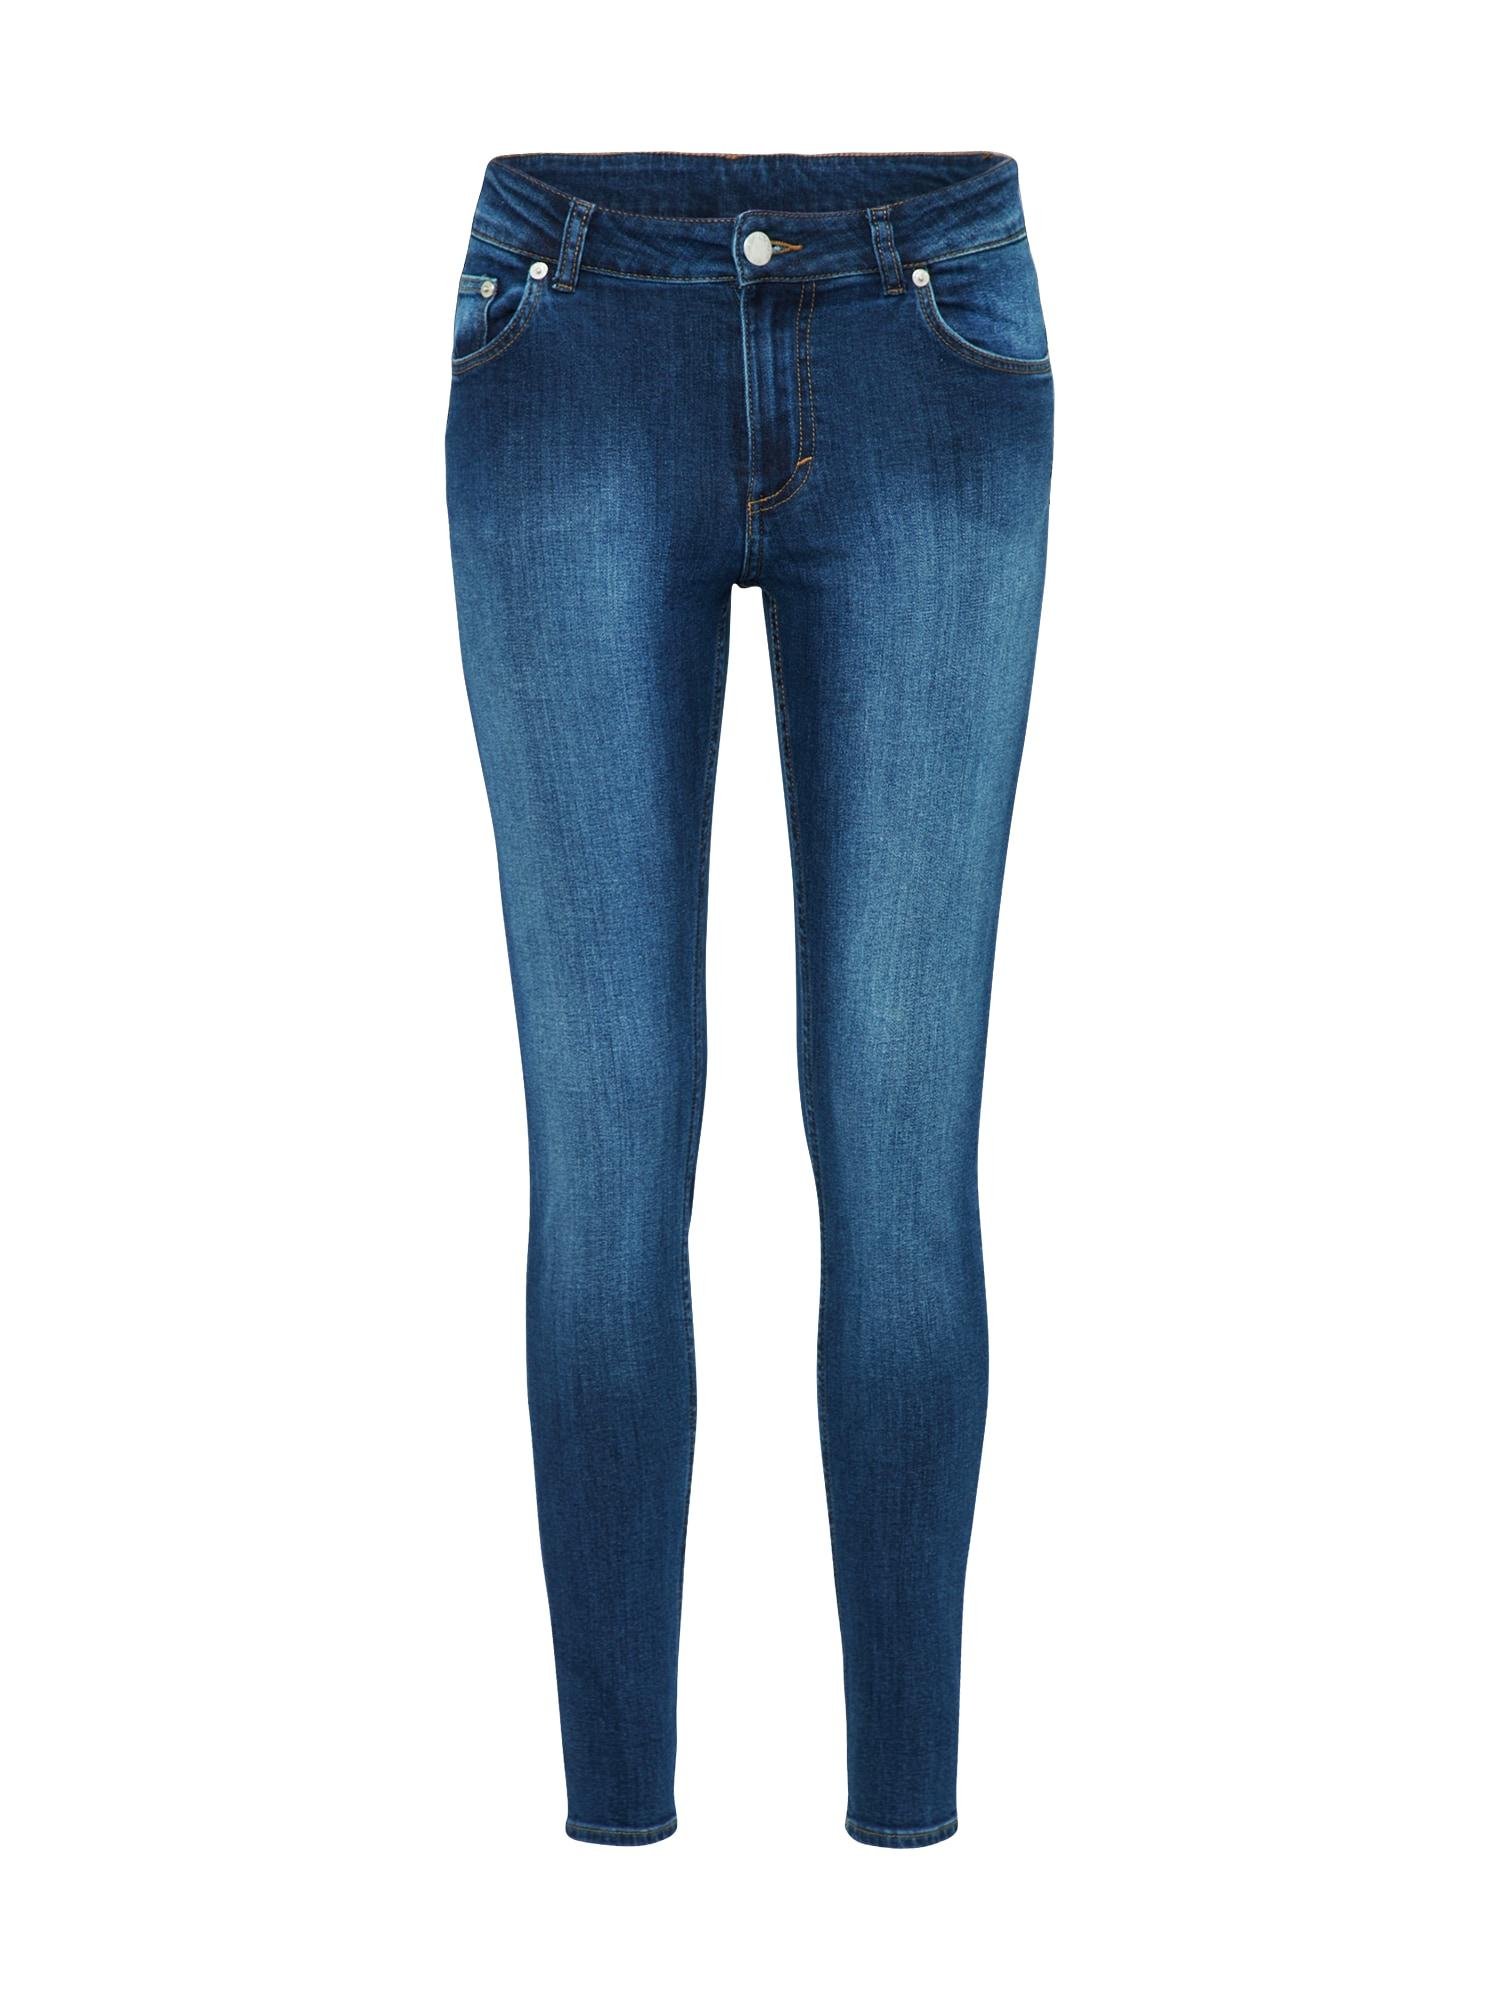 CHEAP MONDAY Dames Jeans Mid Skin blauw